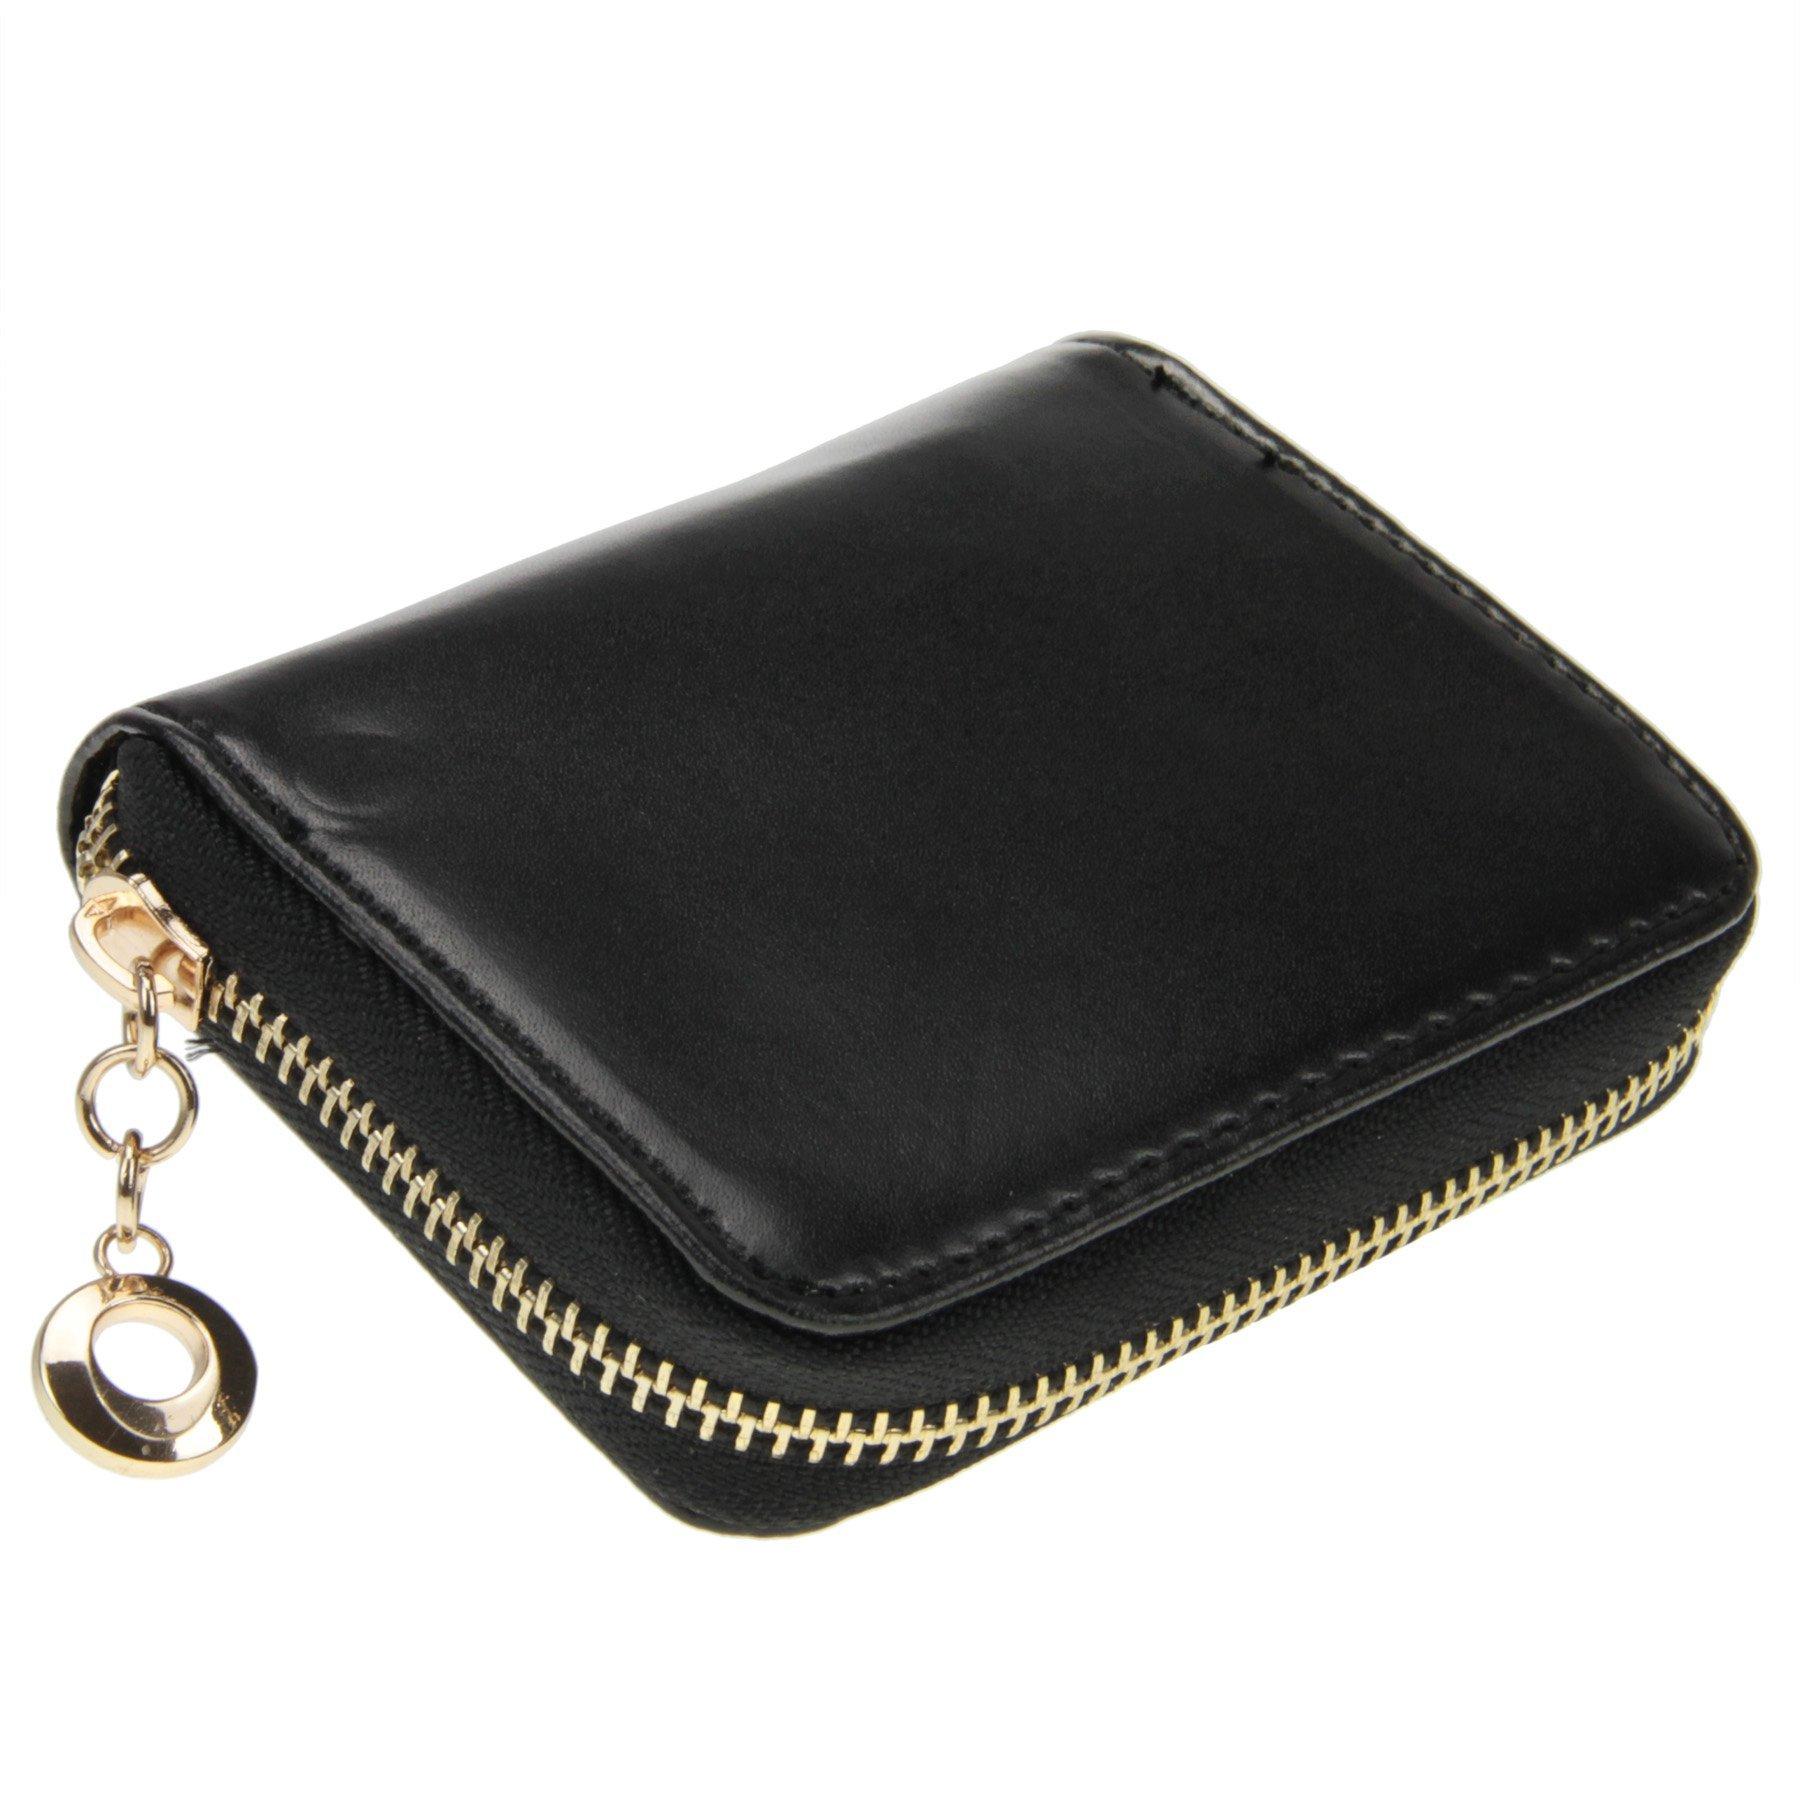 Women Girls Cute Bowknot Waterproof PU Leather Fold Mini Short Wallet Coin Purse Zipper Card Case Holder Clutch Small Handbag Nice Gift by Fakeface (Image #4)